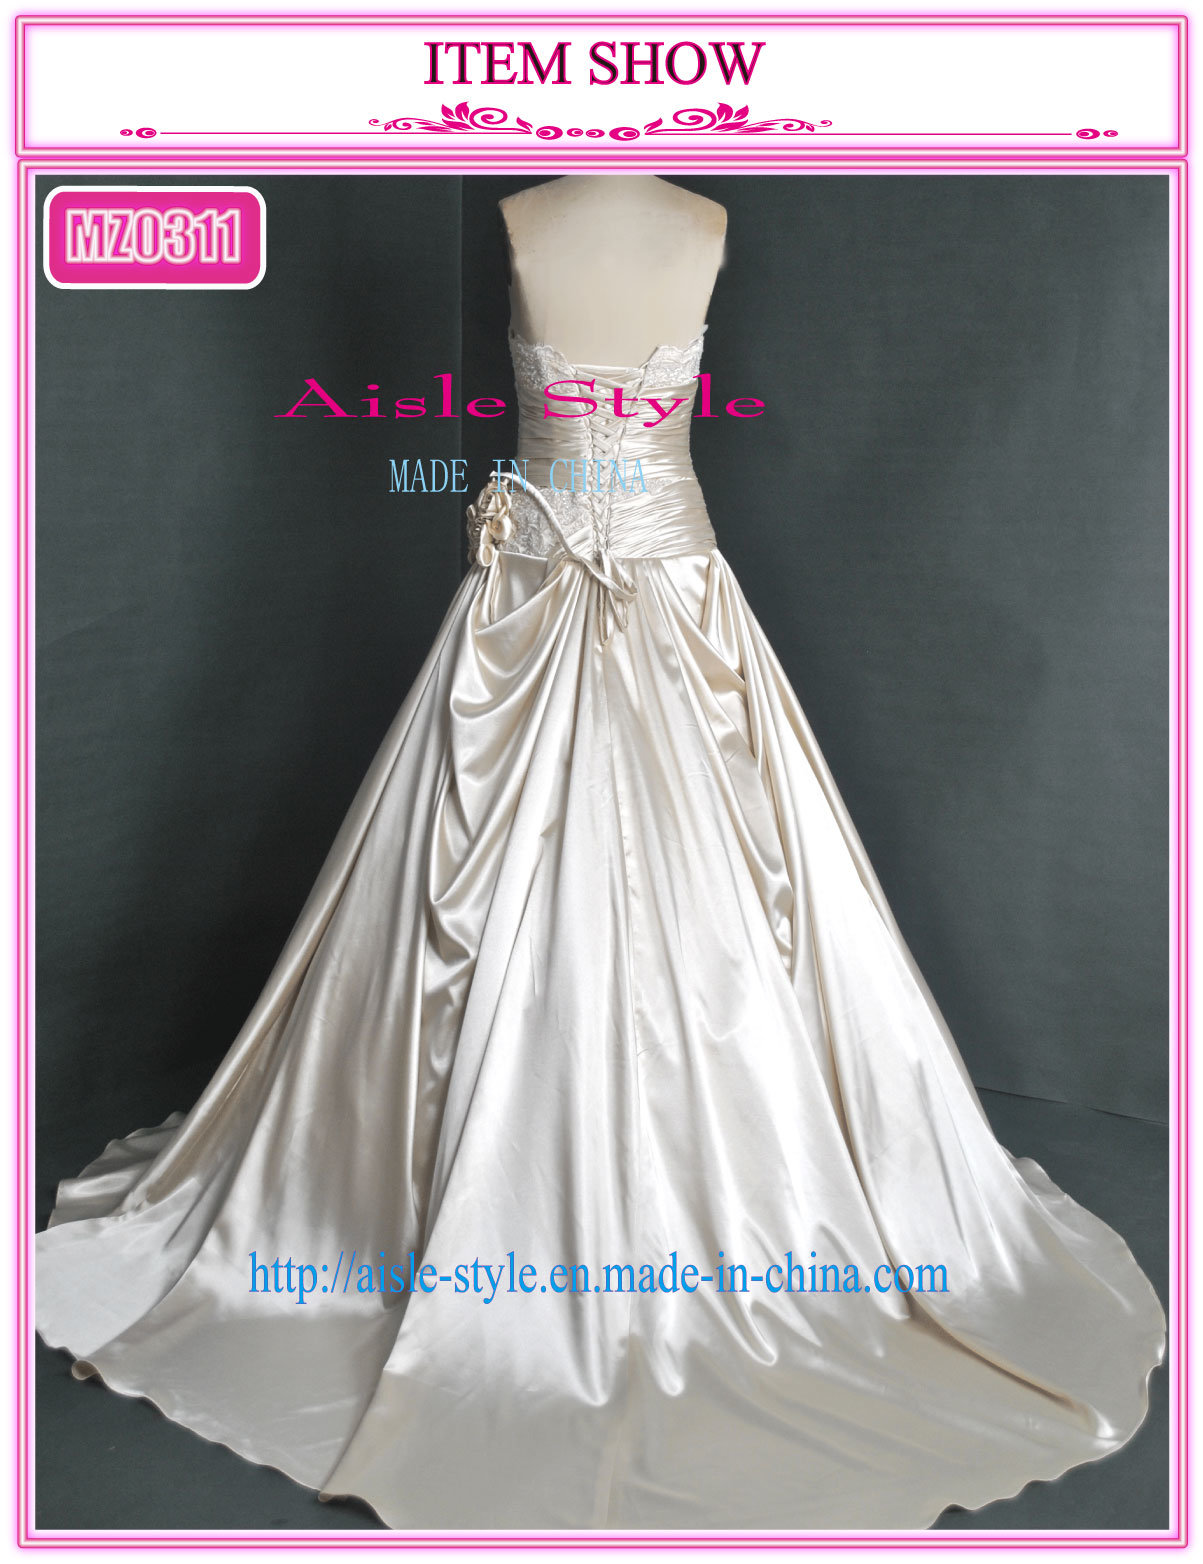 Bridal Gowns Orange County Mission Viejo Ca : Discount wedding gowns orange county ca short